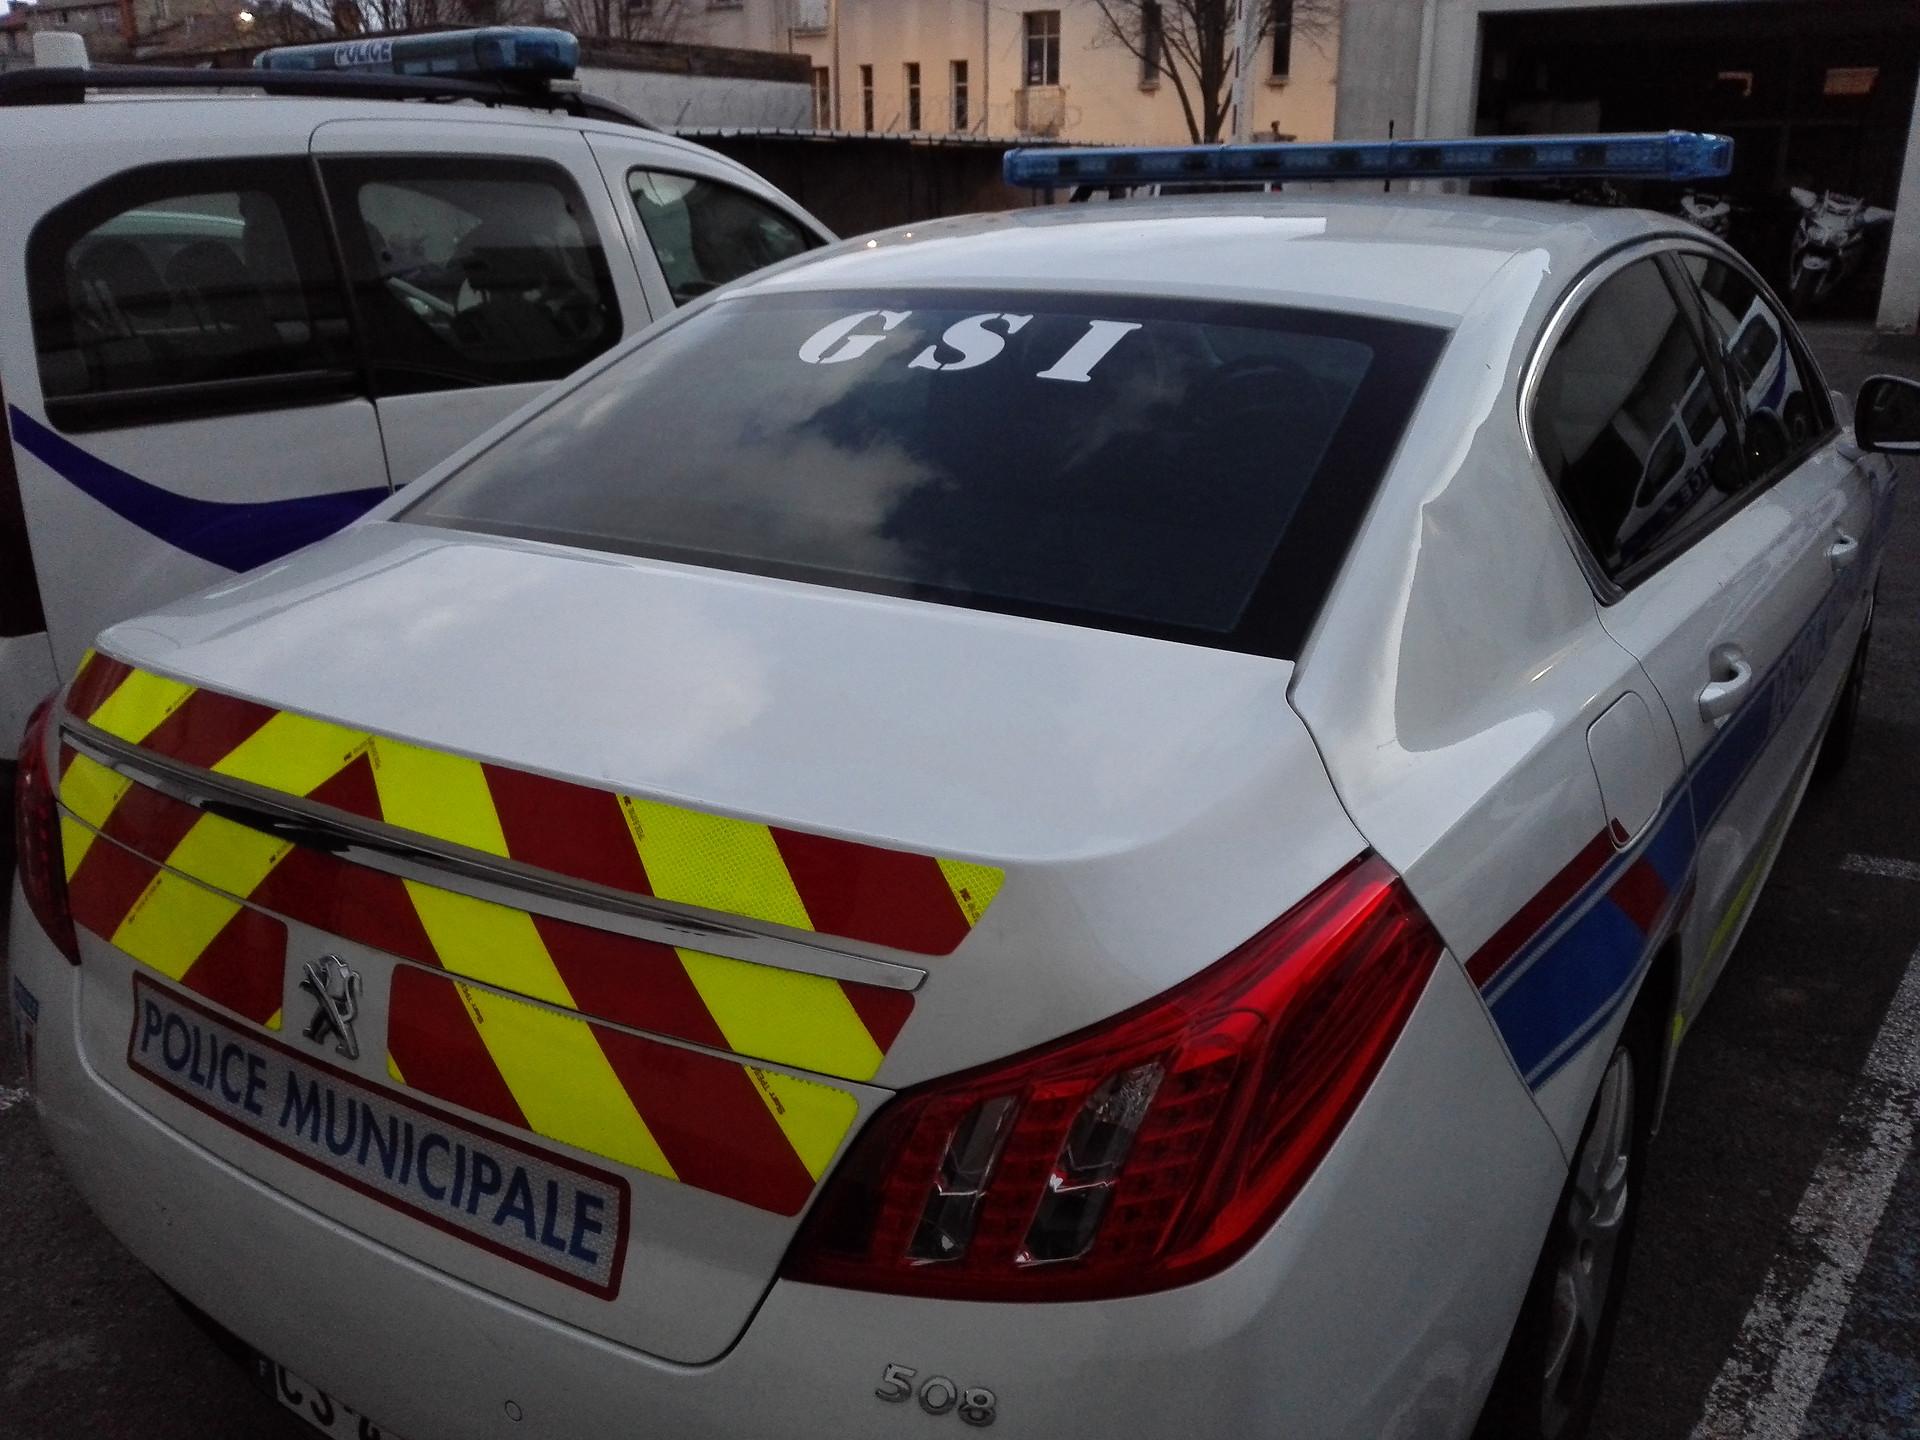 LETTRAGE POLICE MUNICIPALE BÉZIERS GSI